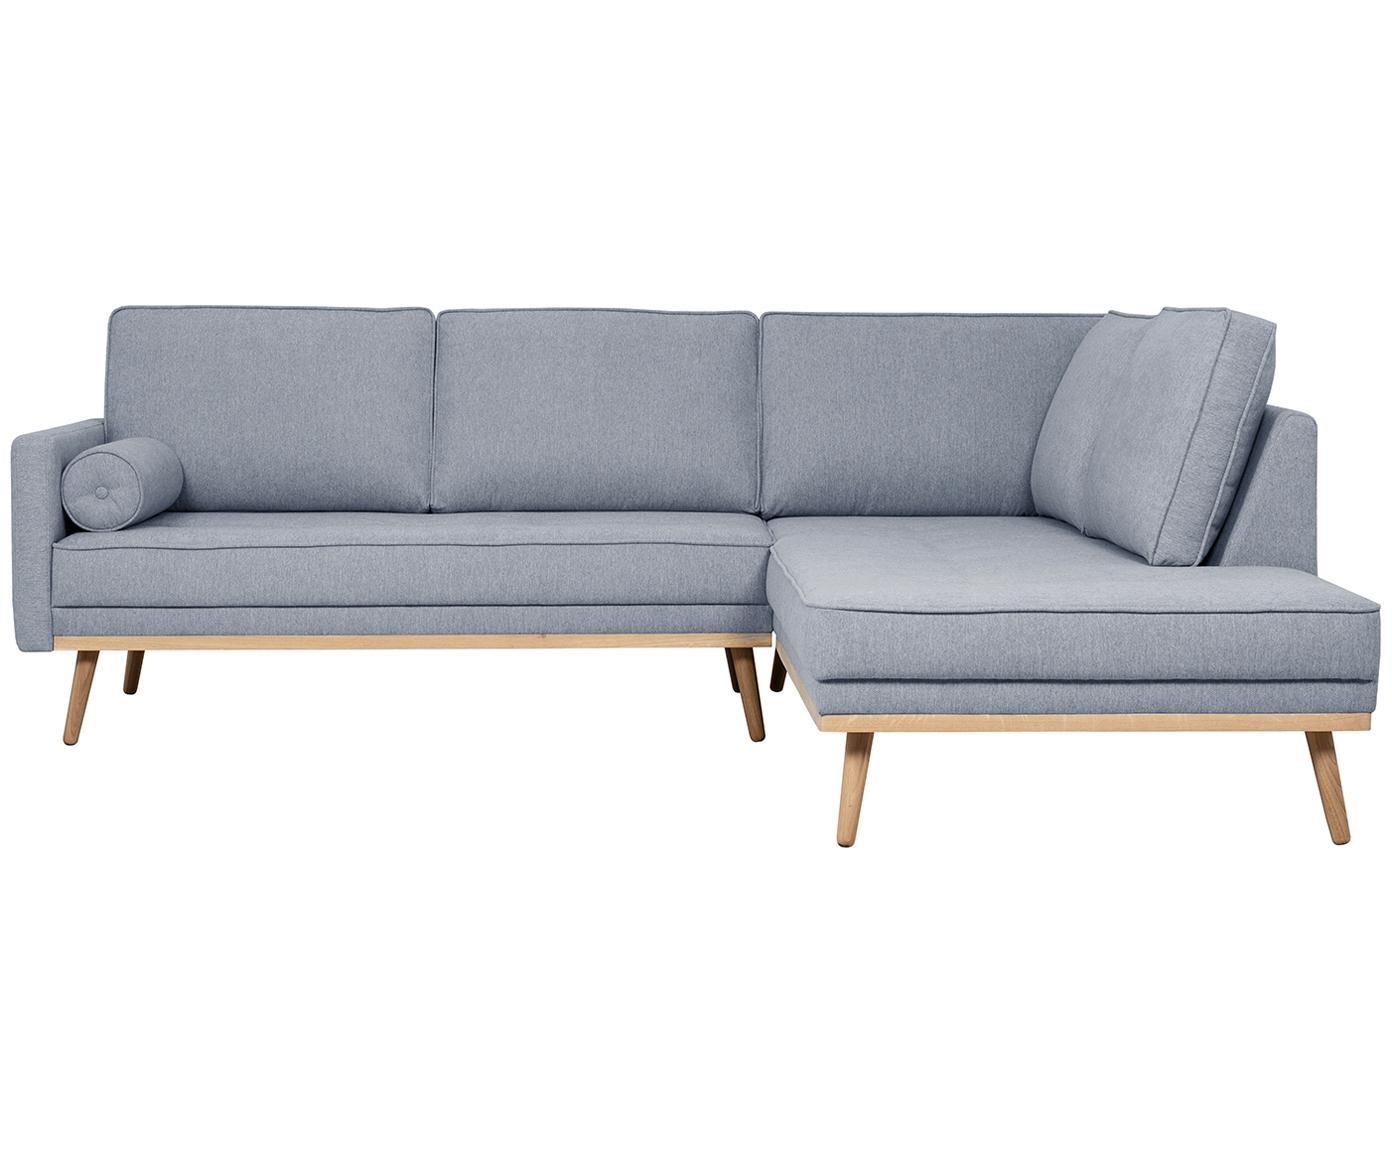 Hoekbank Saint (3-zits), Bekleding: polyester, Frame: massief grenenhout, spaan, Blauwgrijs, 243 x 70 cm